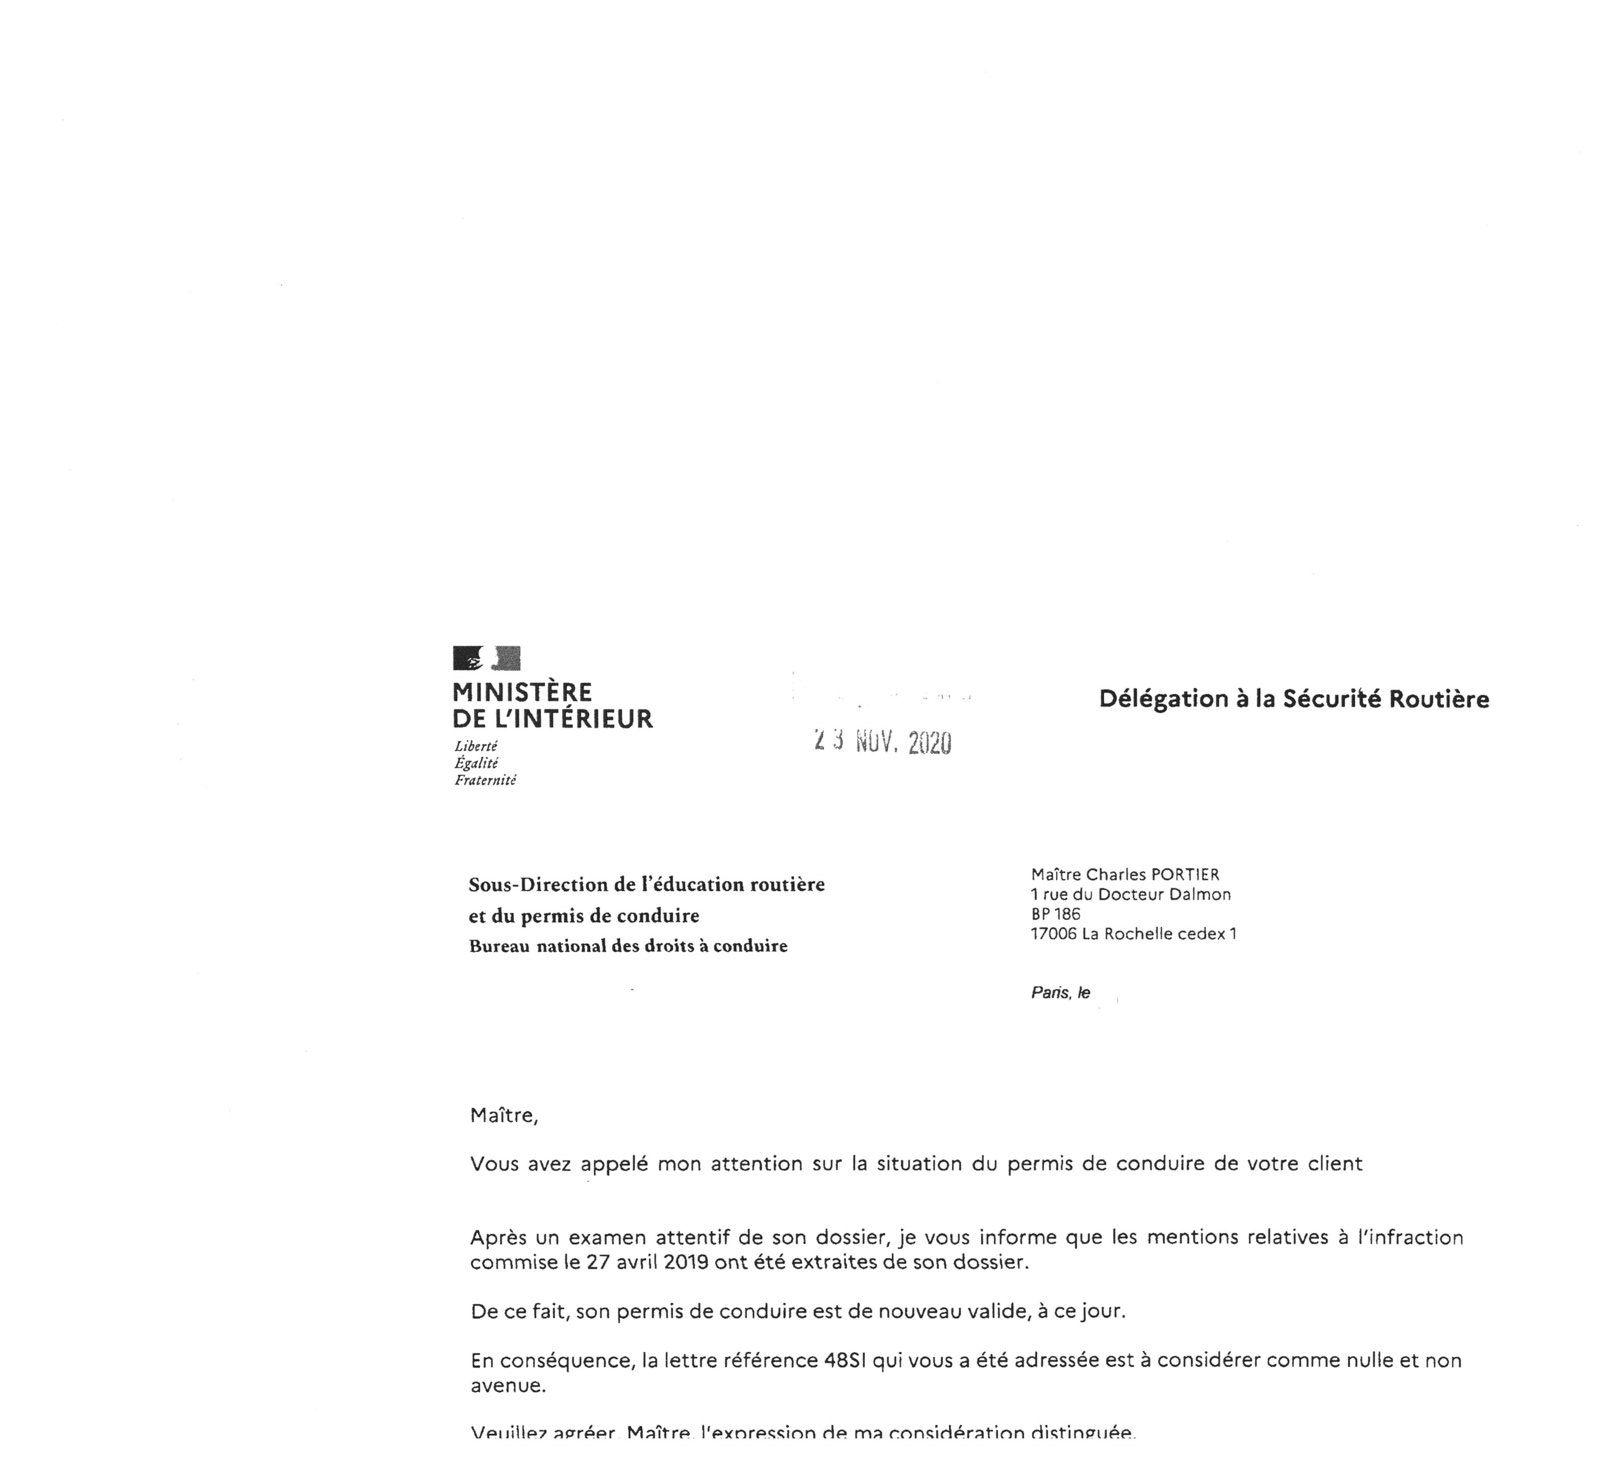 ANNULATION D'UNE LETTRE 48 SI le 23 novembre 2020- PERMIS DE CONDUIRE REVALIDE